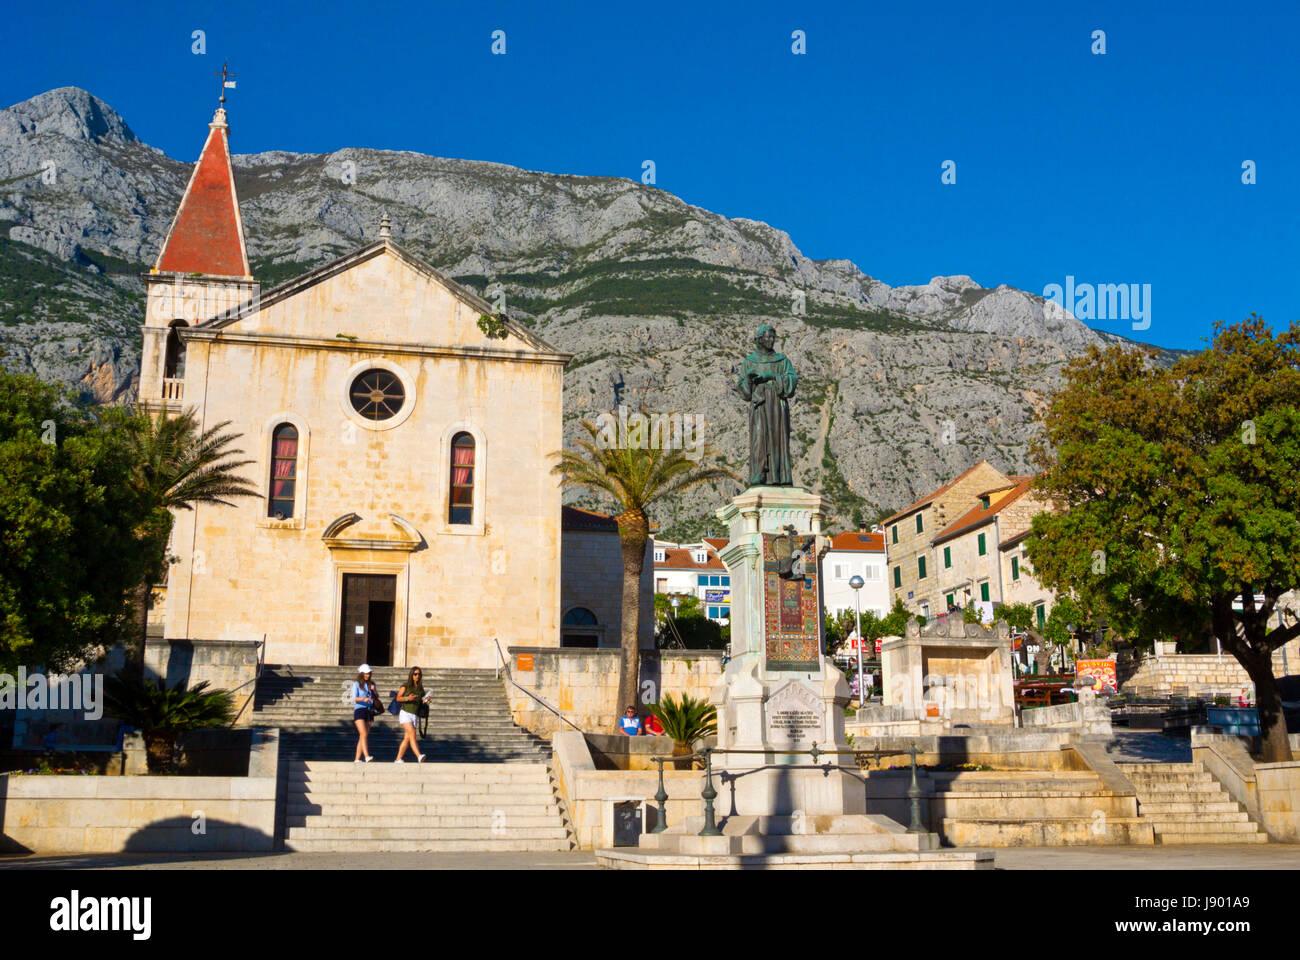 Kačićev trg, main square, Makarska, Dalmatia, Croatia Stock Photo